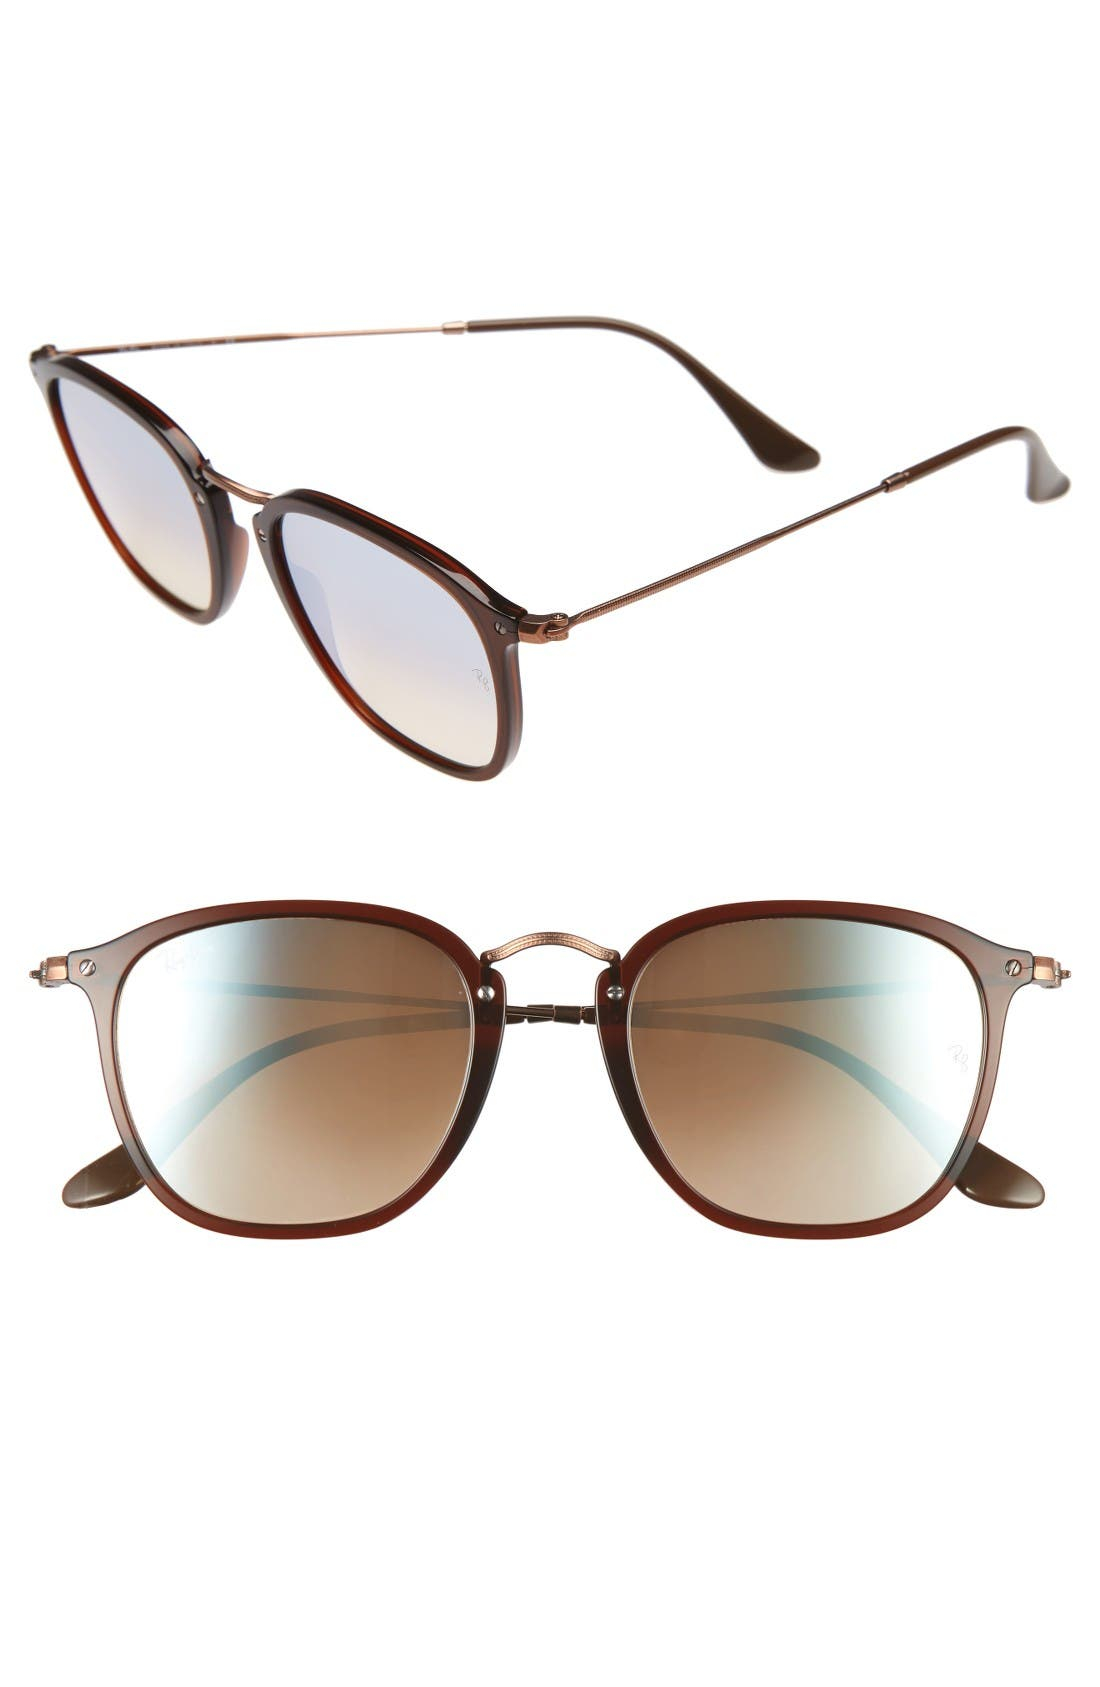 Ray-Ban Icons Wayfarer 51mm Sunglasses